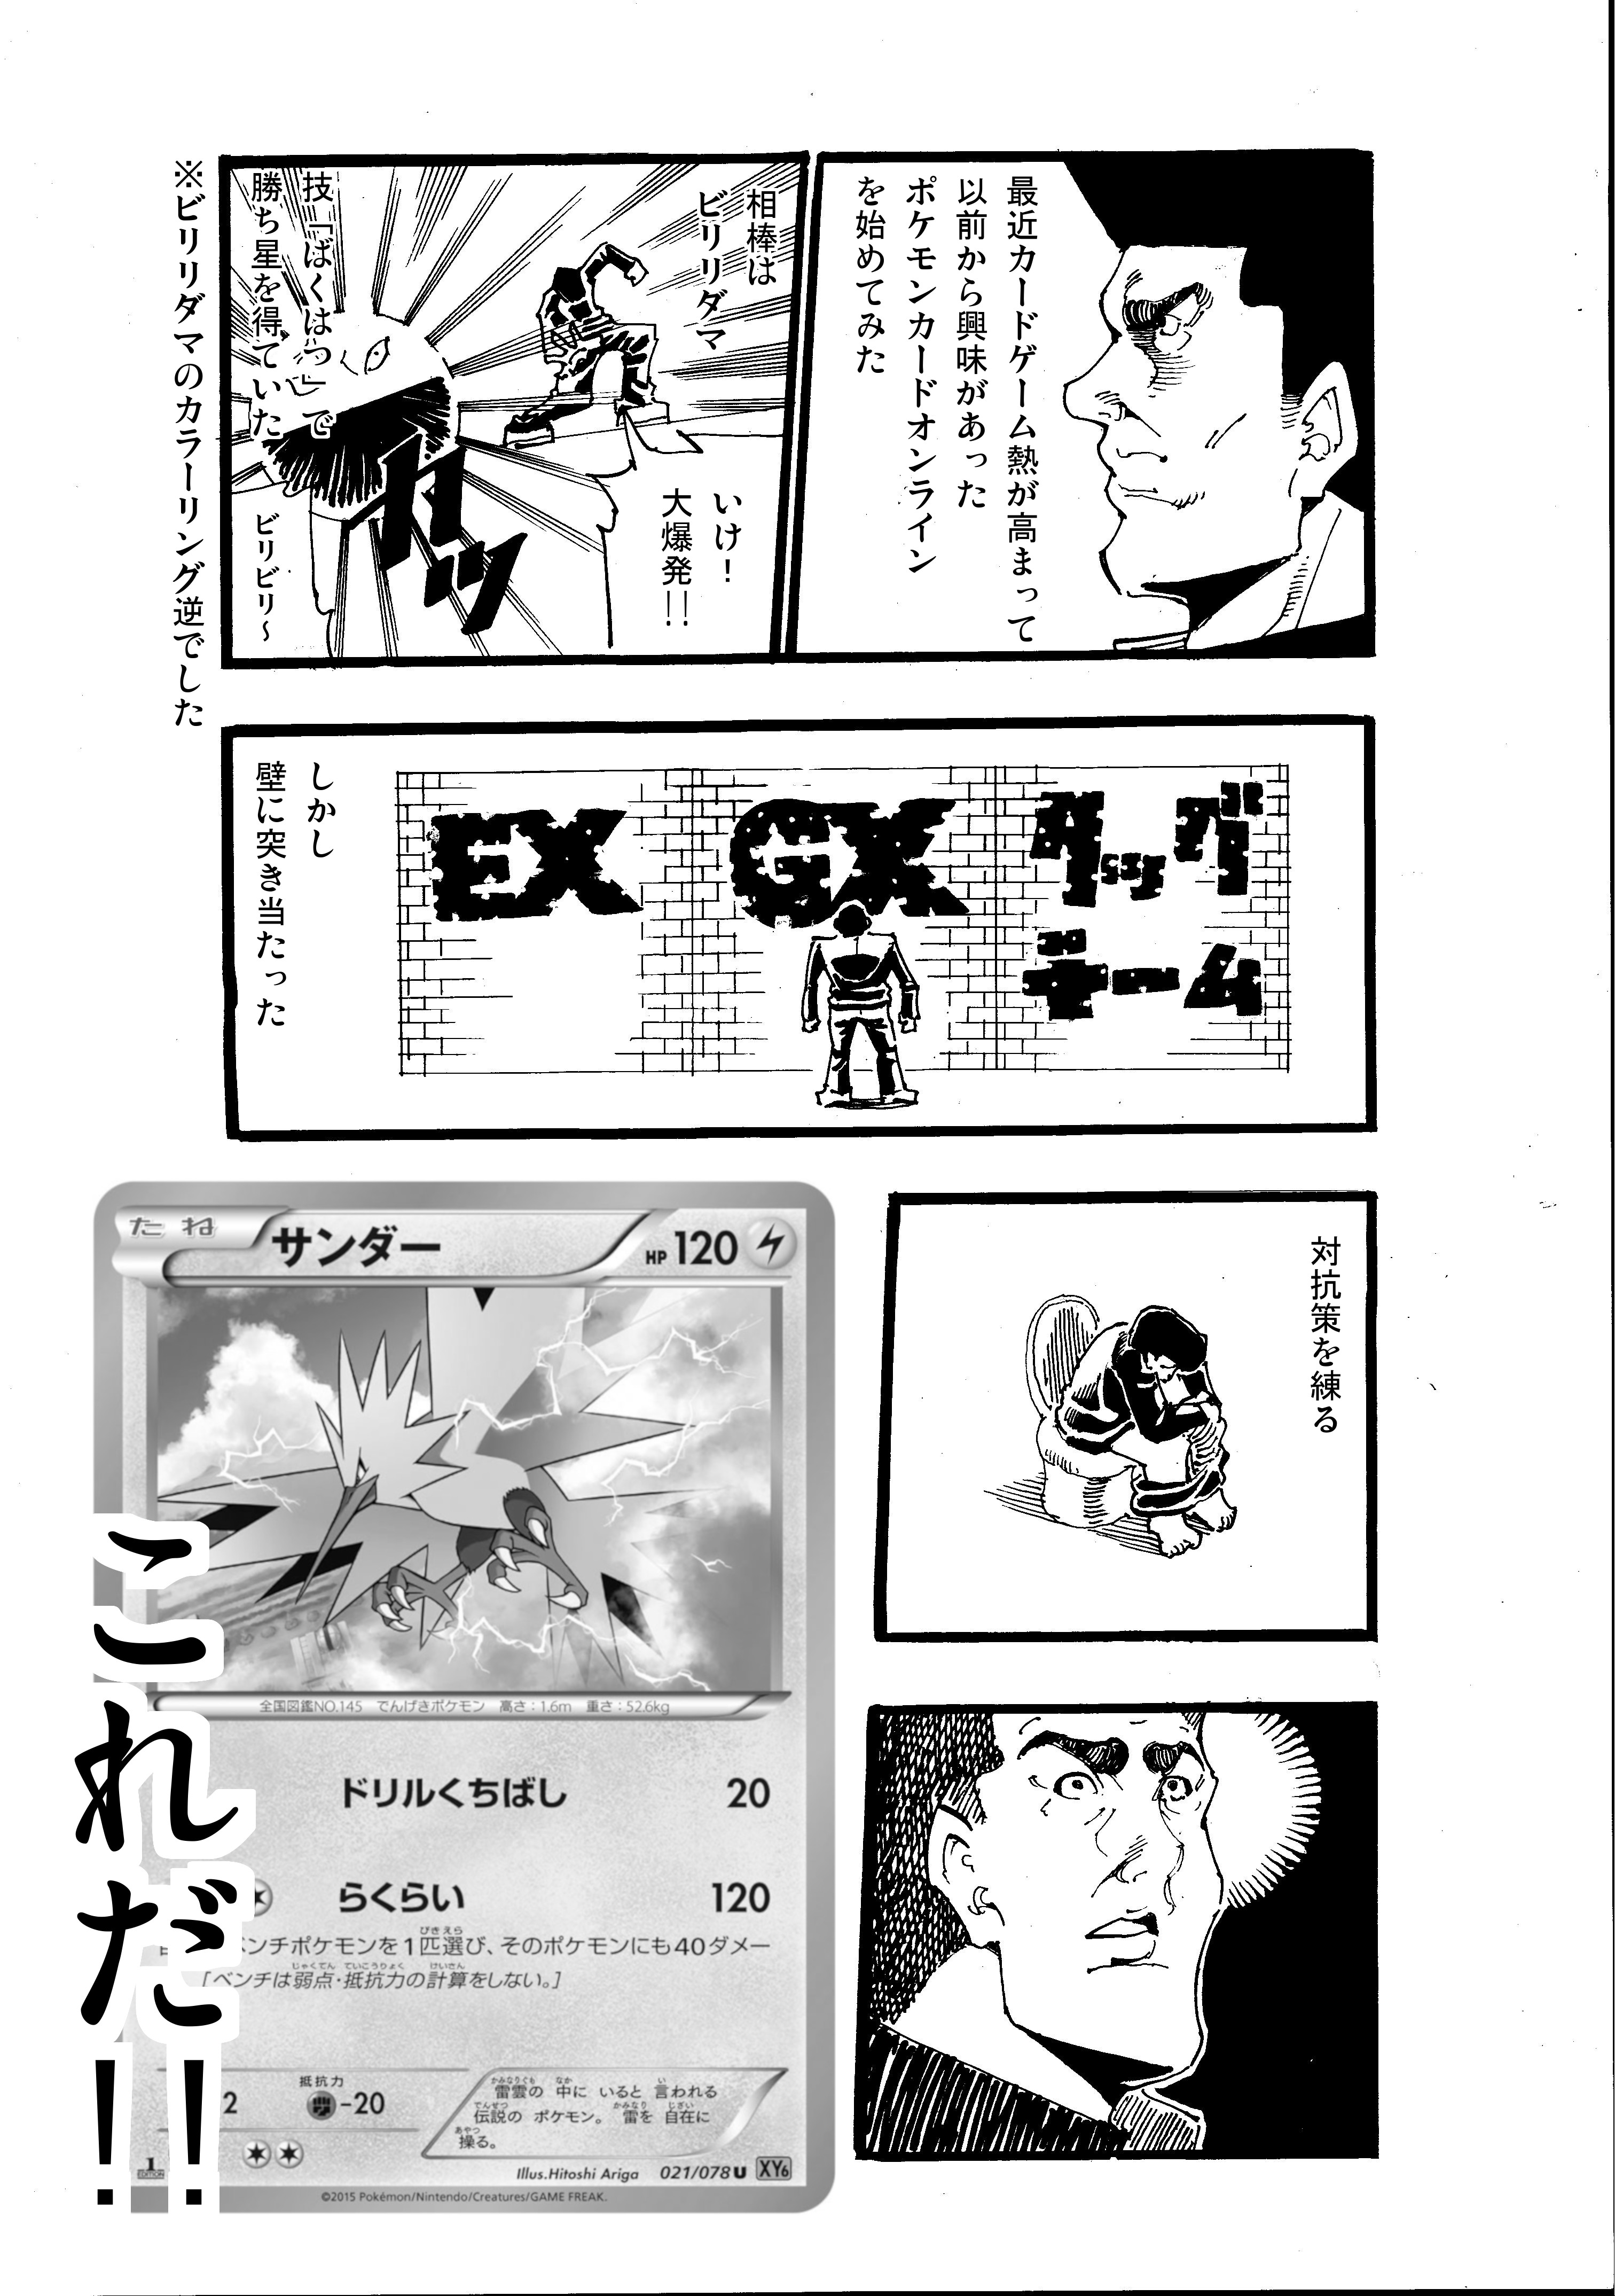 PTCGO日記2